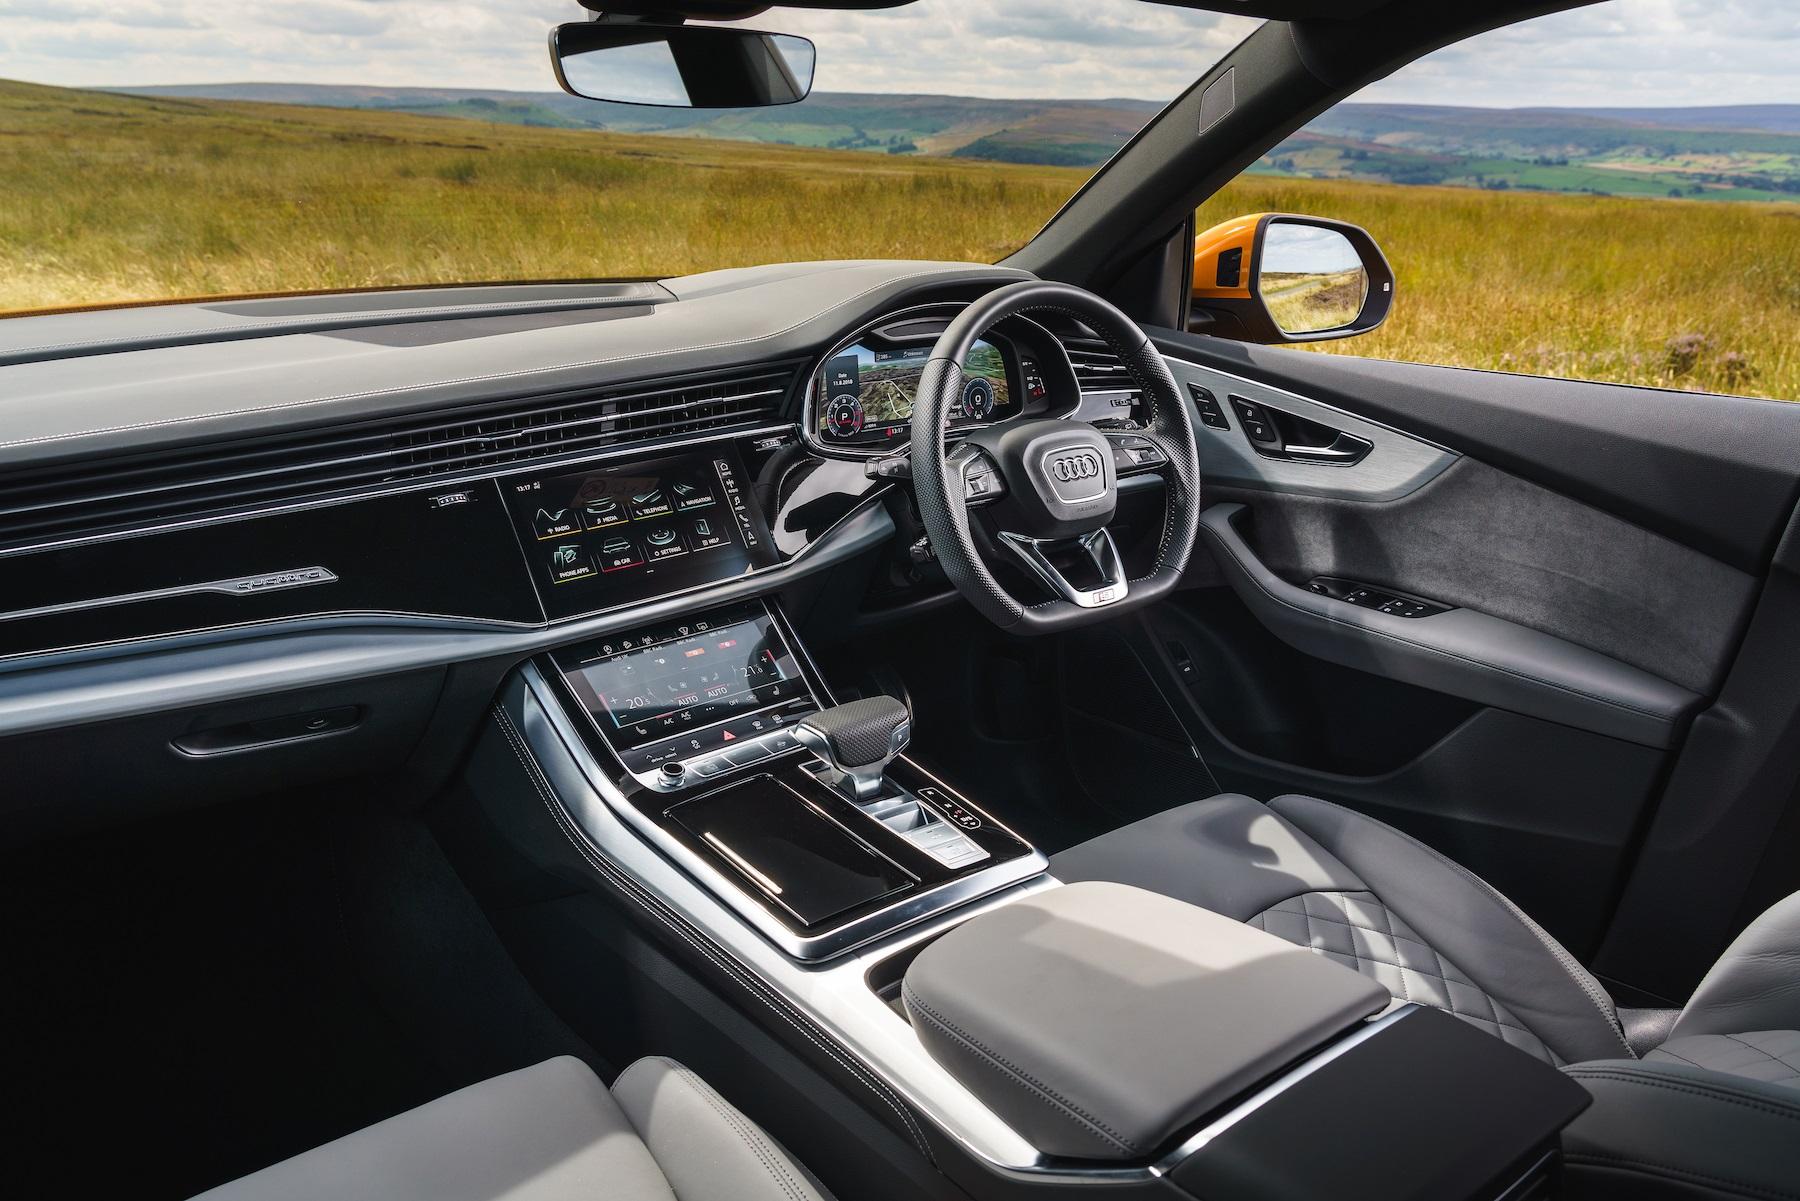 Interior of Audi A7 dashboard